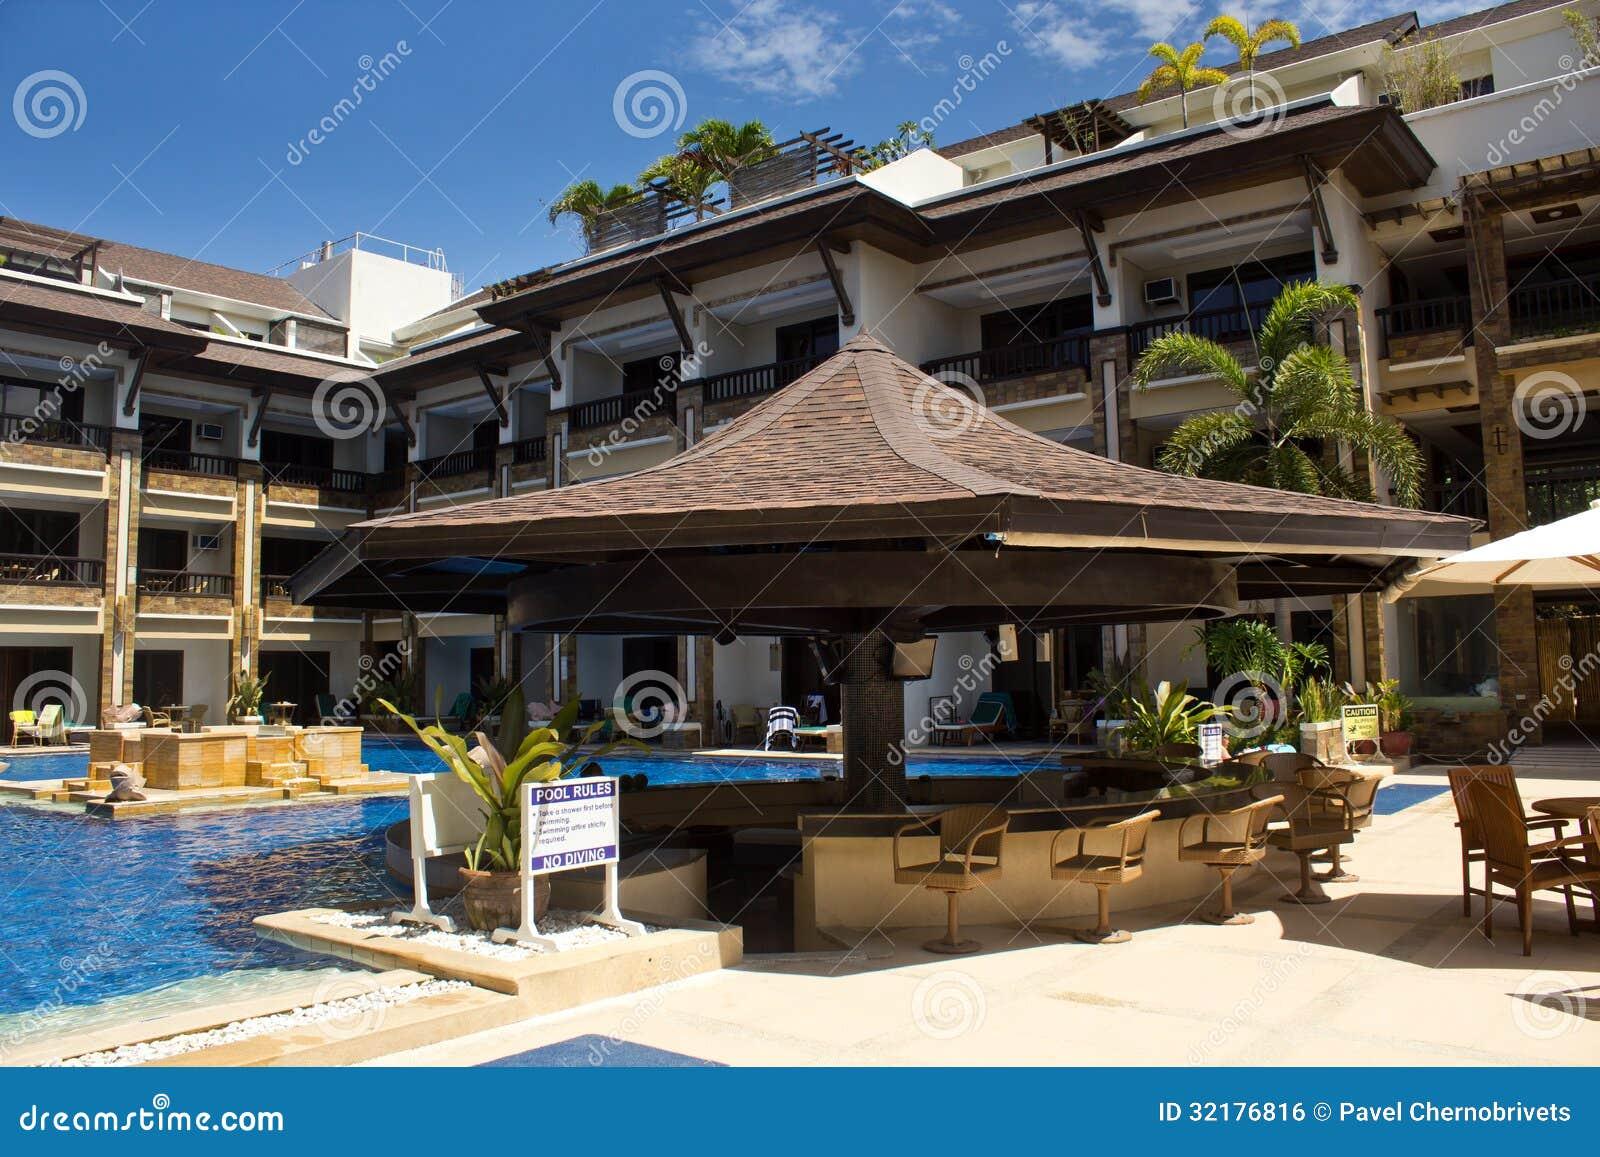 Swimming Pool And Bar Royalty Free Stock Image Image